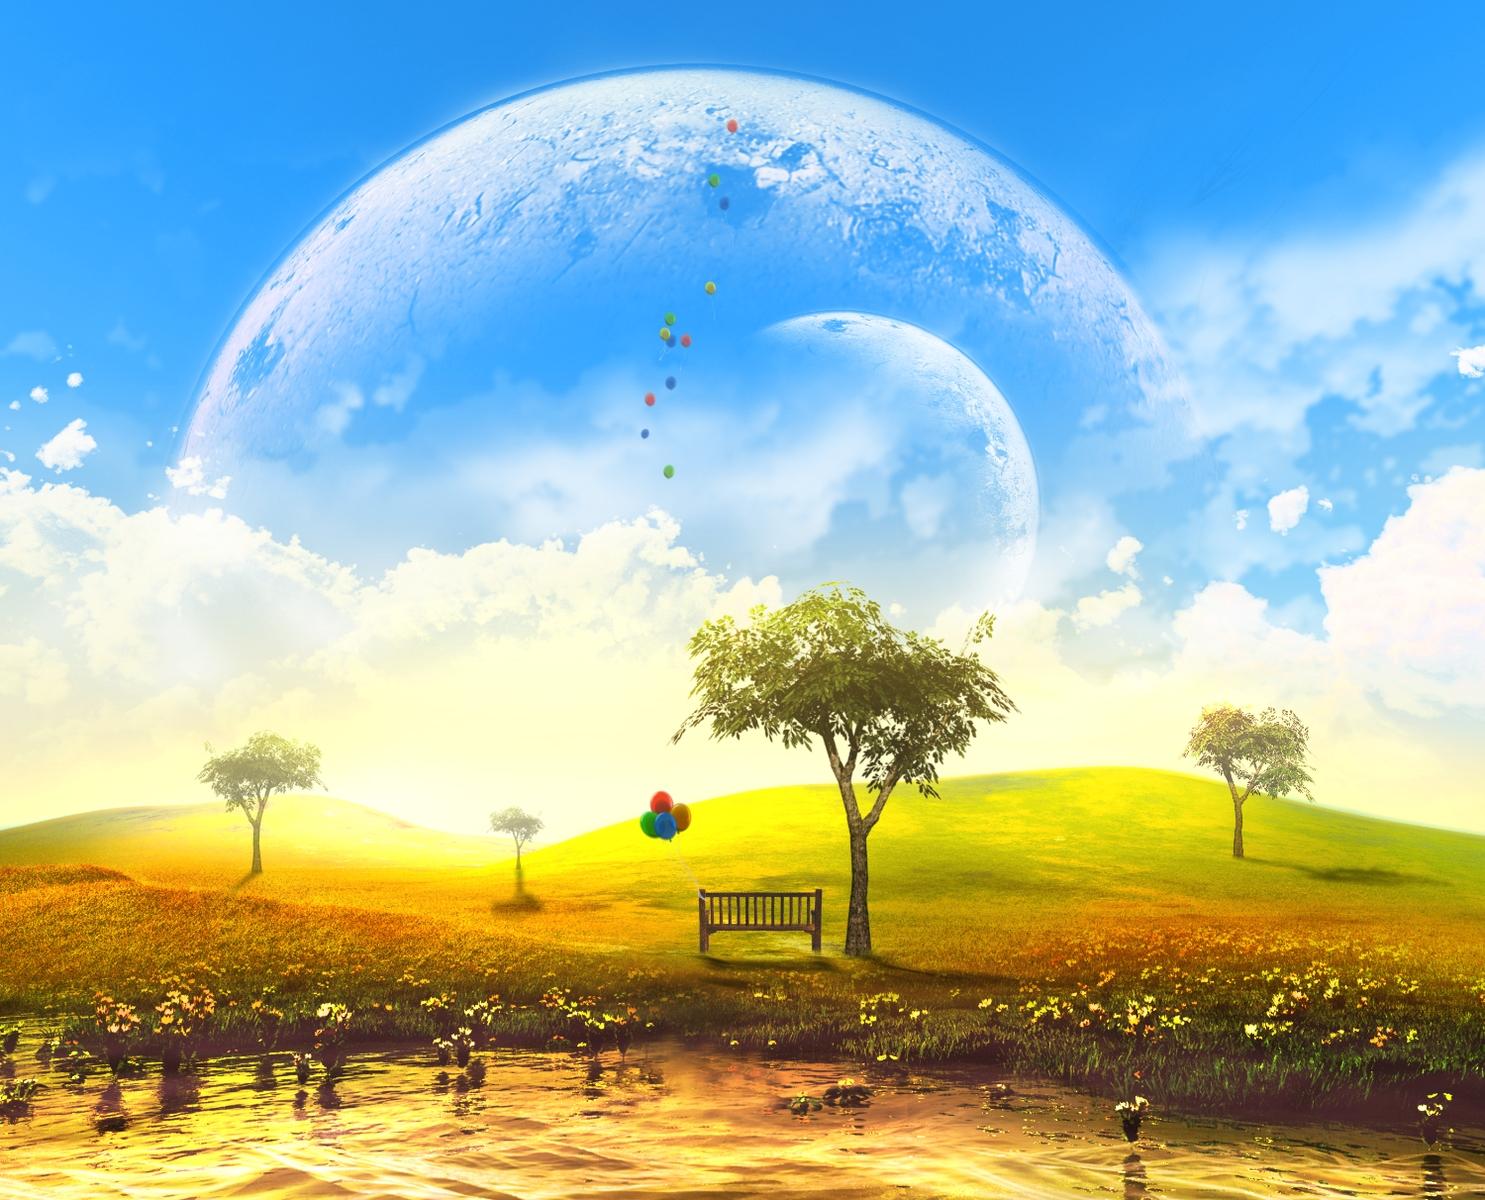 3d clouds flowers grass landscape moon nobody original scenic sky tree water y-k